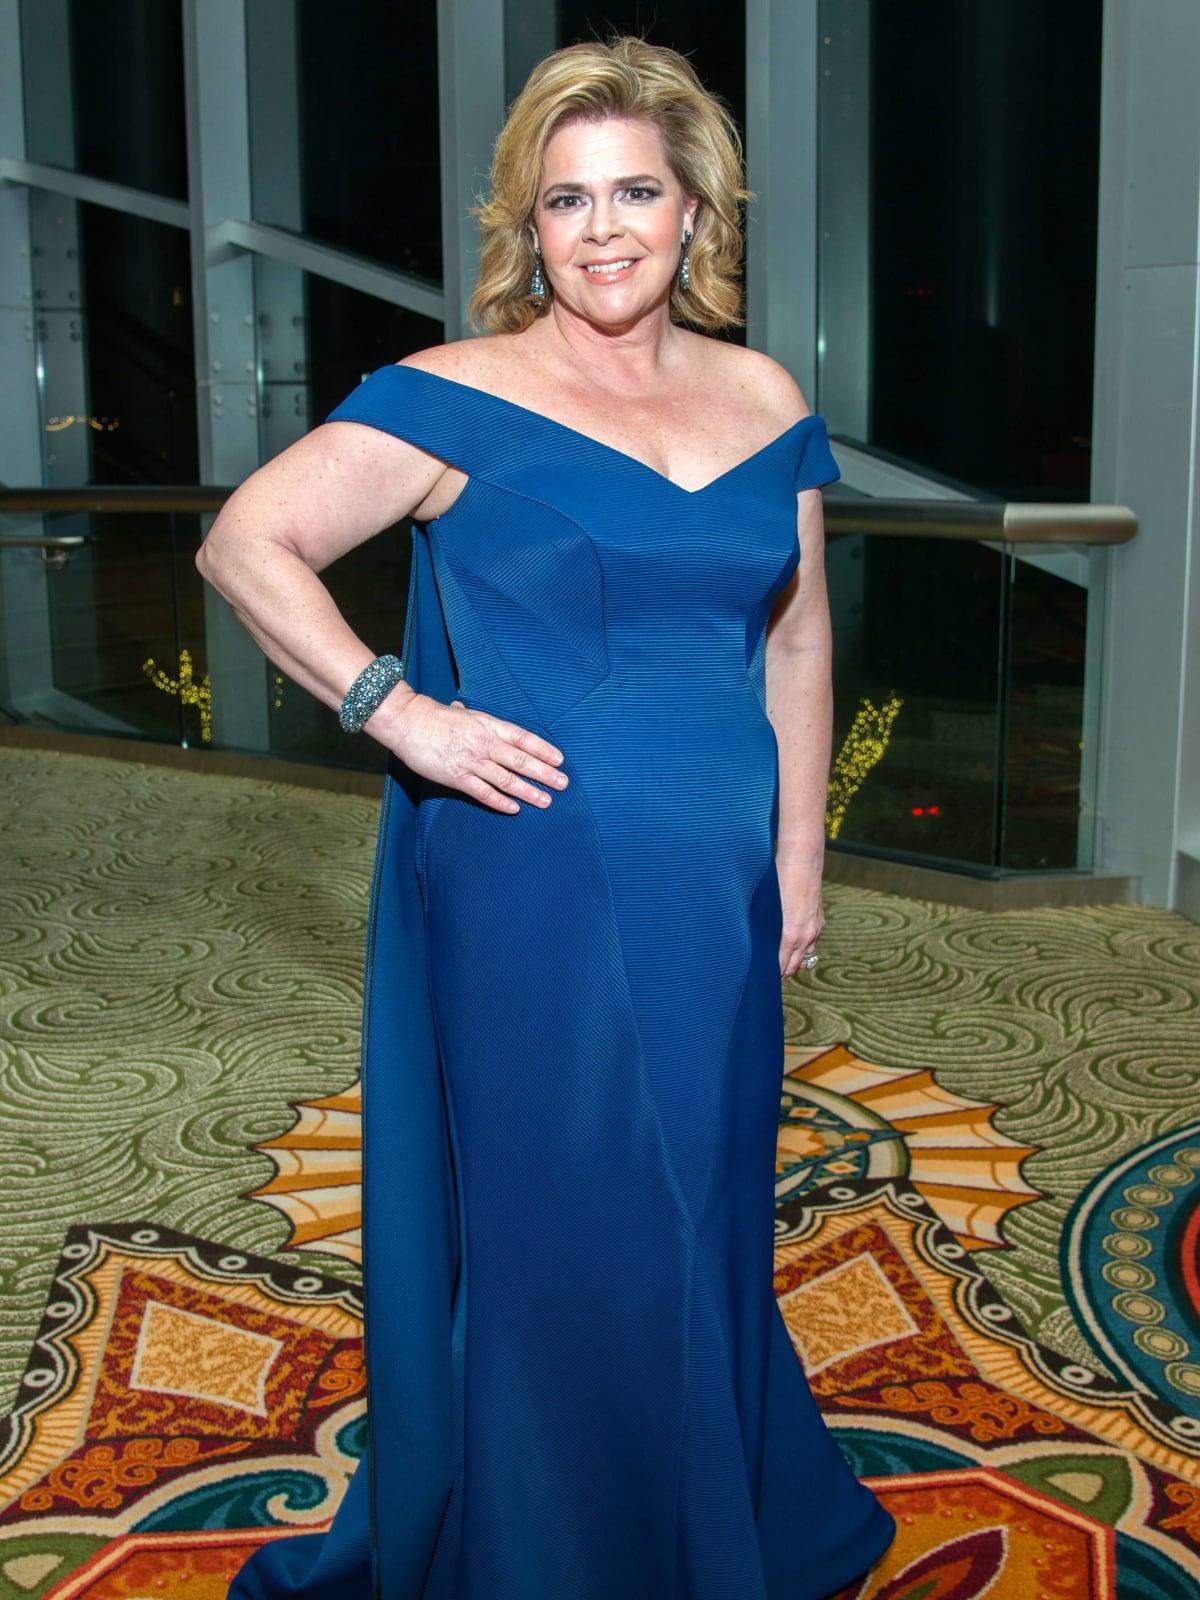 Houston, Women of Distinction fashionable gowns, Feb 2017, Kelli Weinzierl